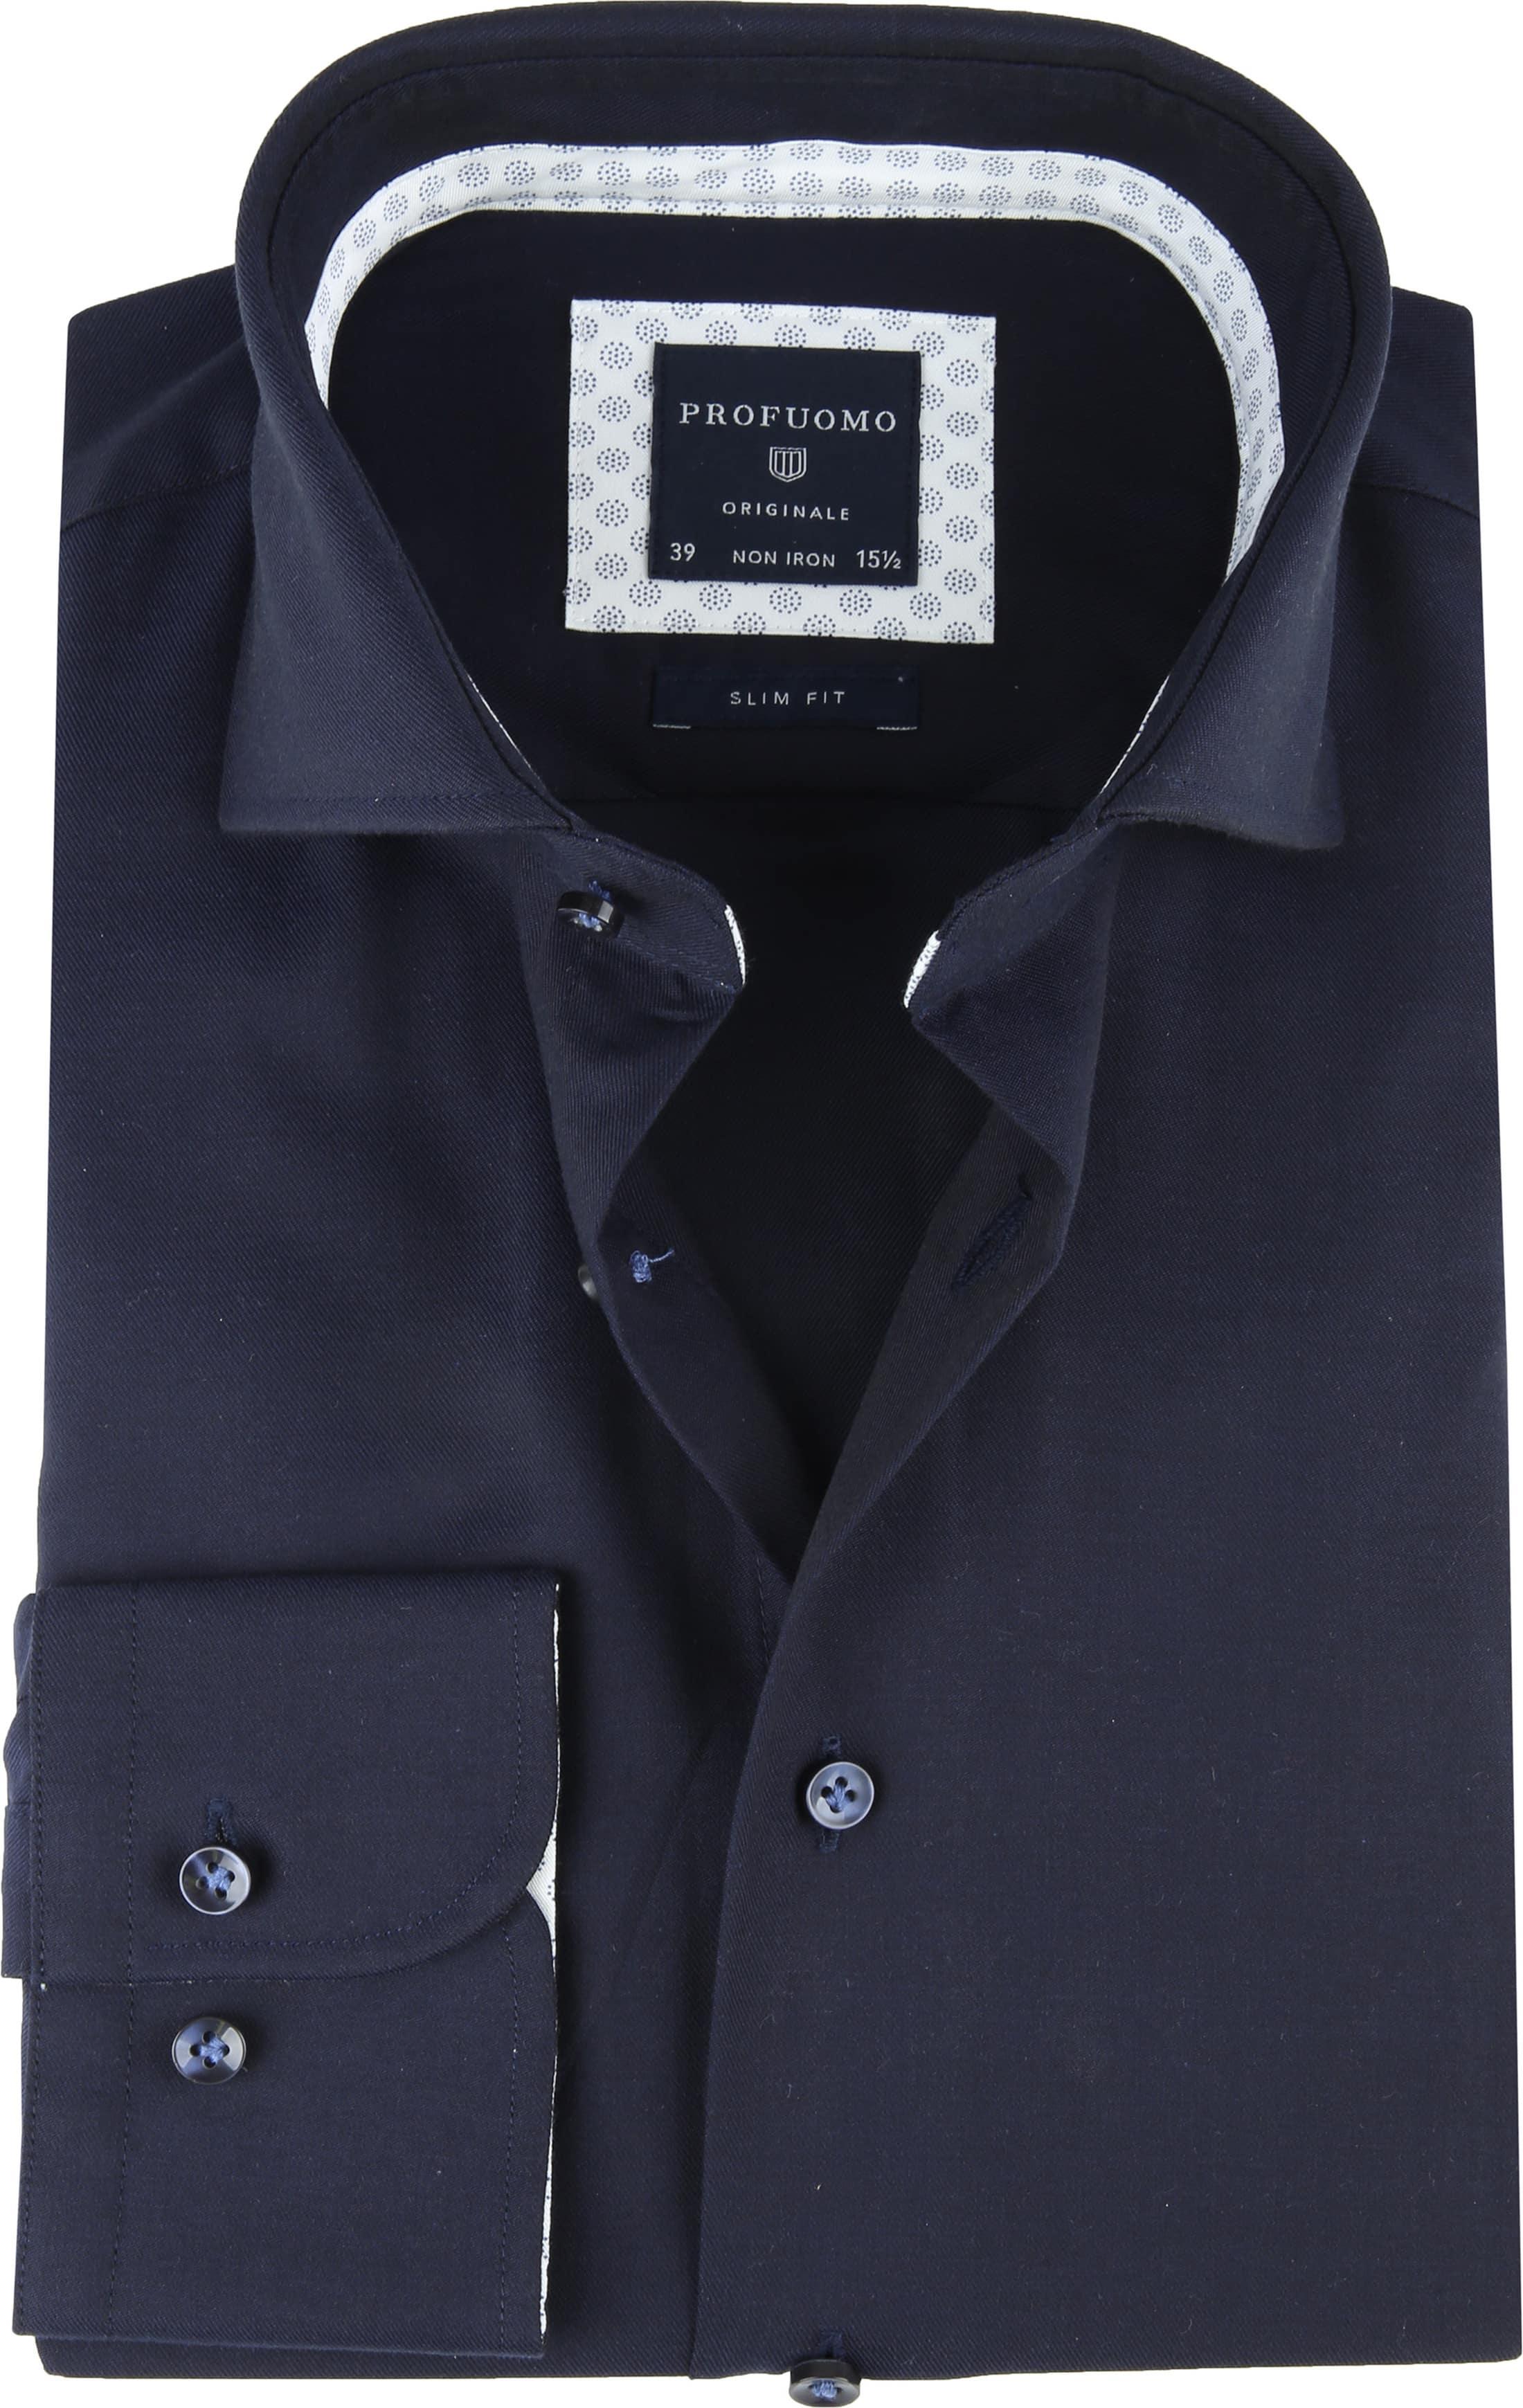 Profuomo SF Overhemd Donkerblauw foto 0